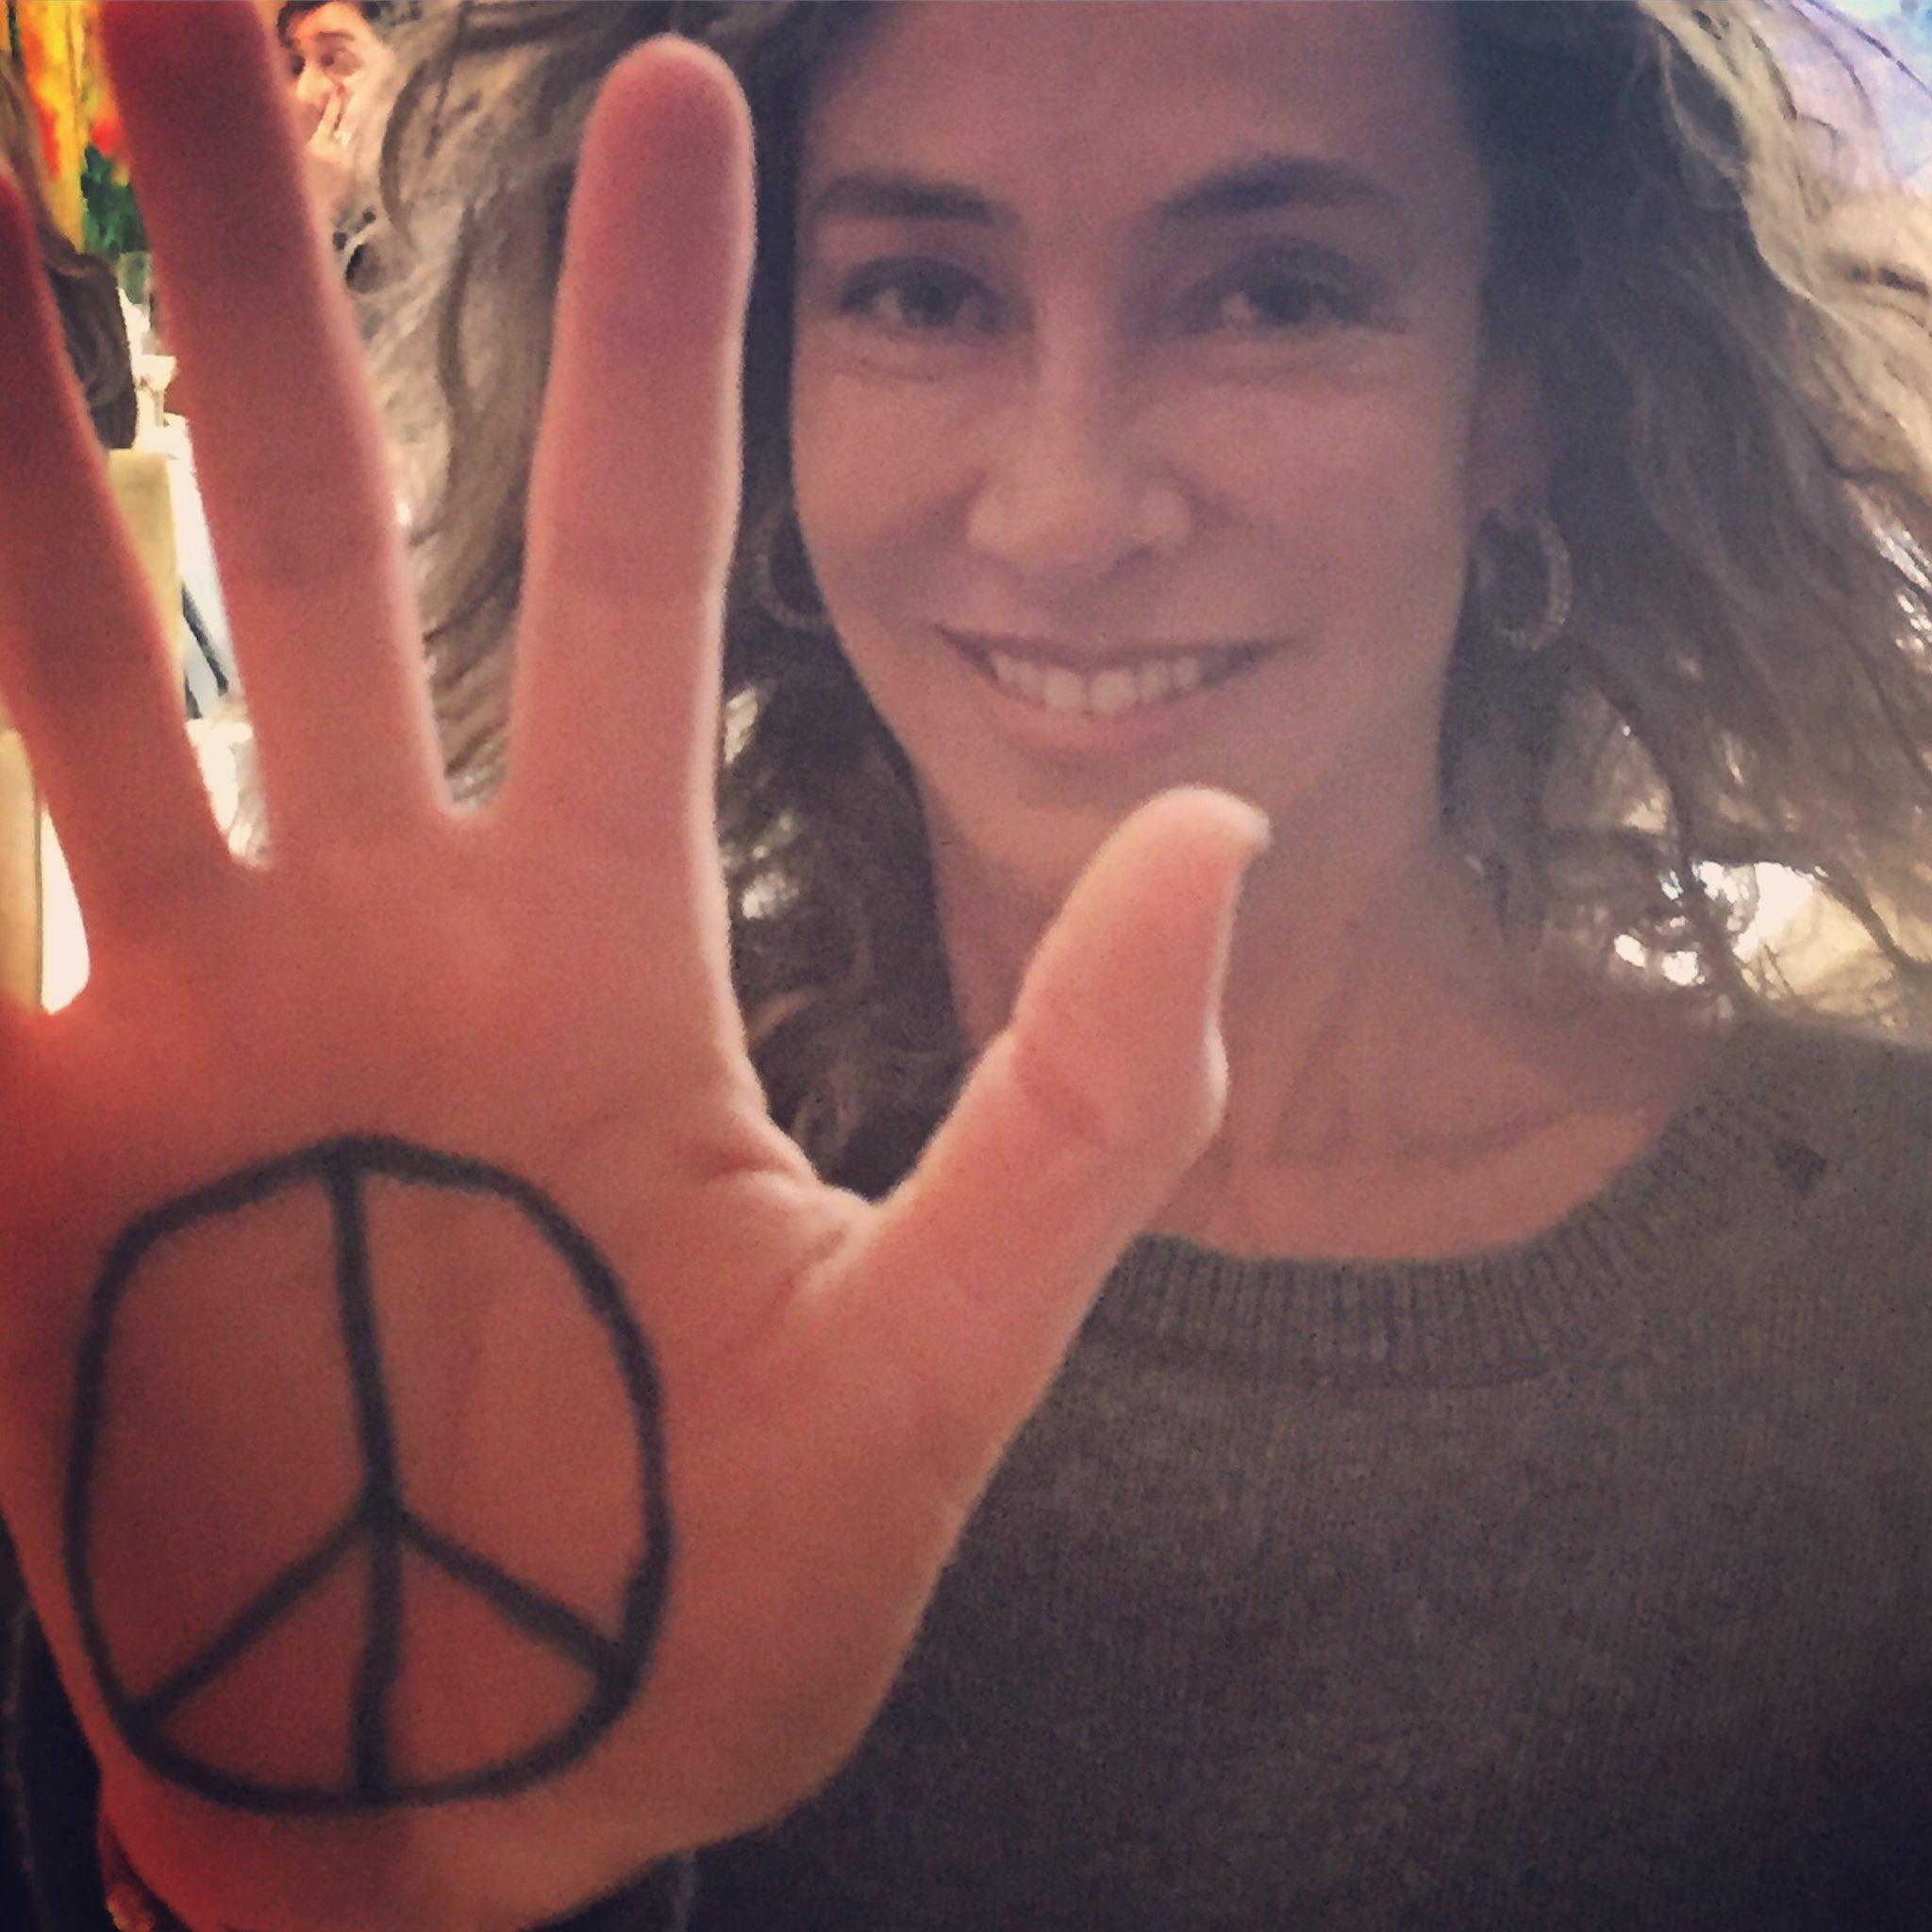 #Peace4Colombia https://t.co/lqizwWToqU